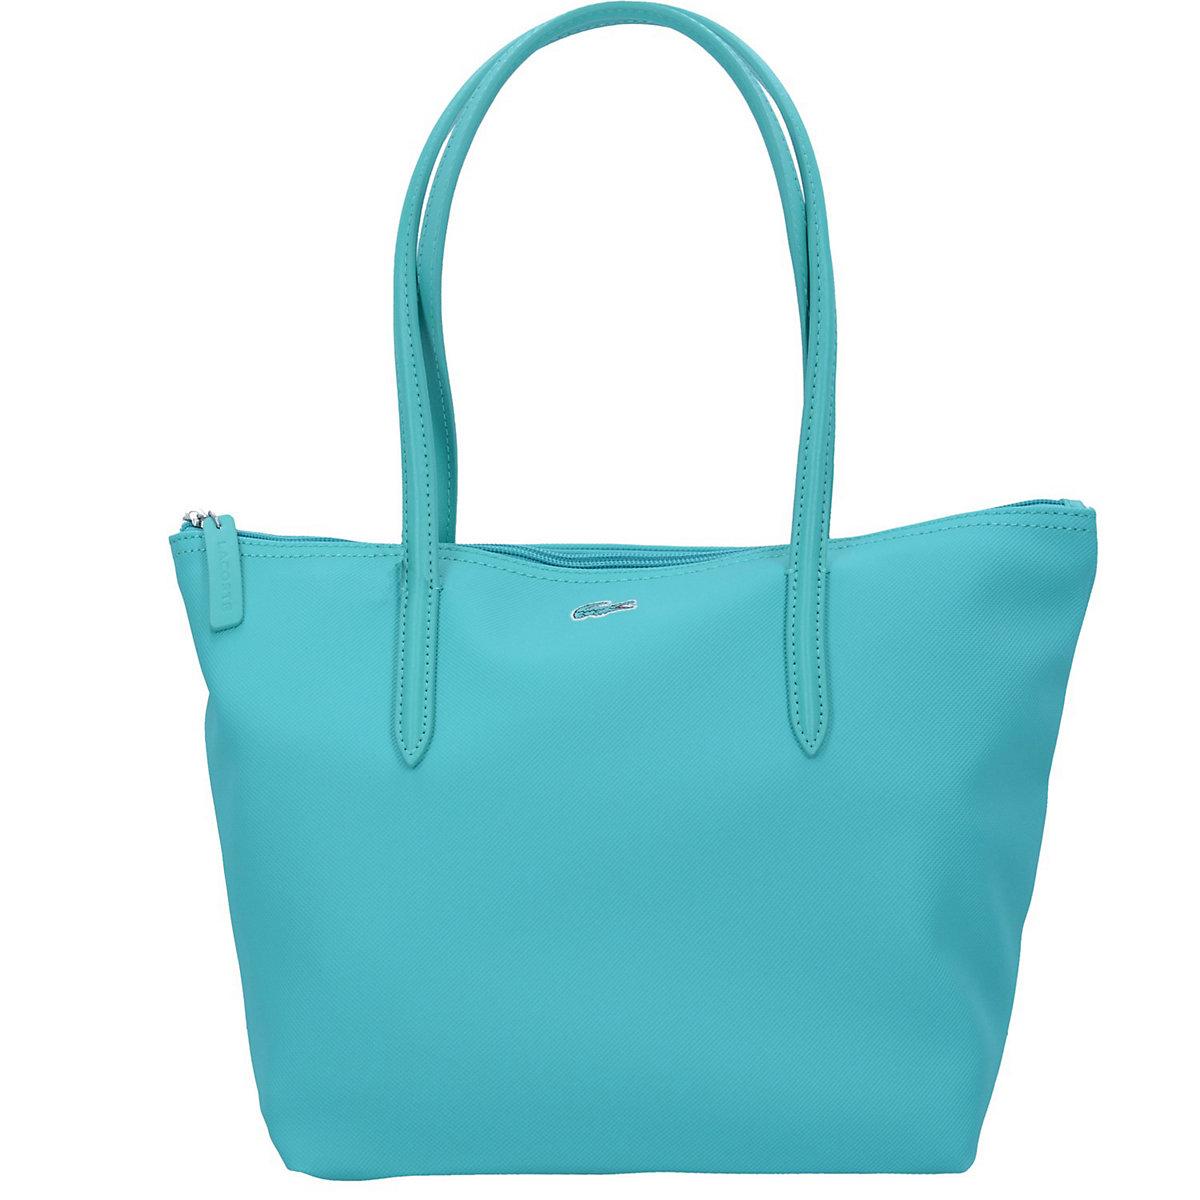 lacoste sac femme l1212 concept schultertasche 24 cm t rkis mirapodo. Black Bedroom Furniture Sets. Home Design Ideas